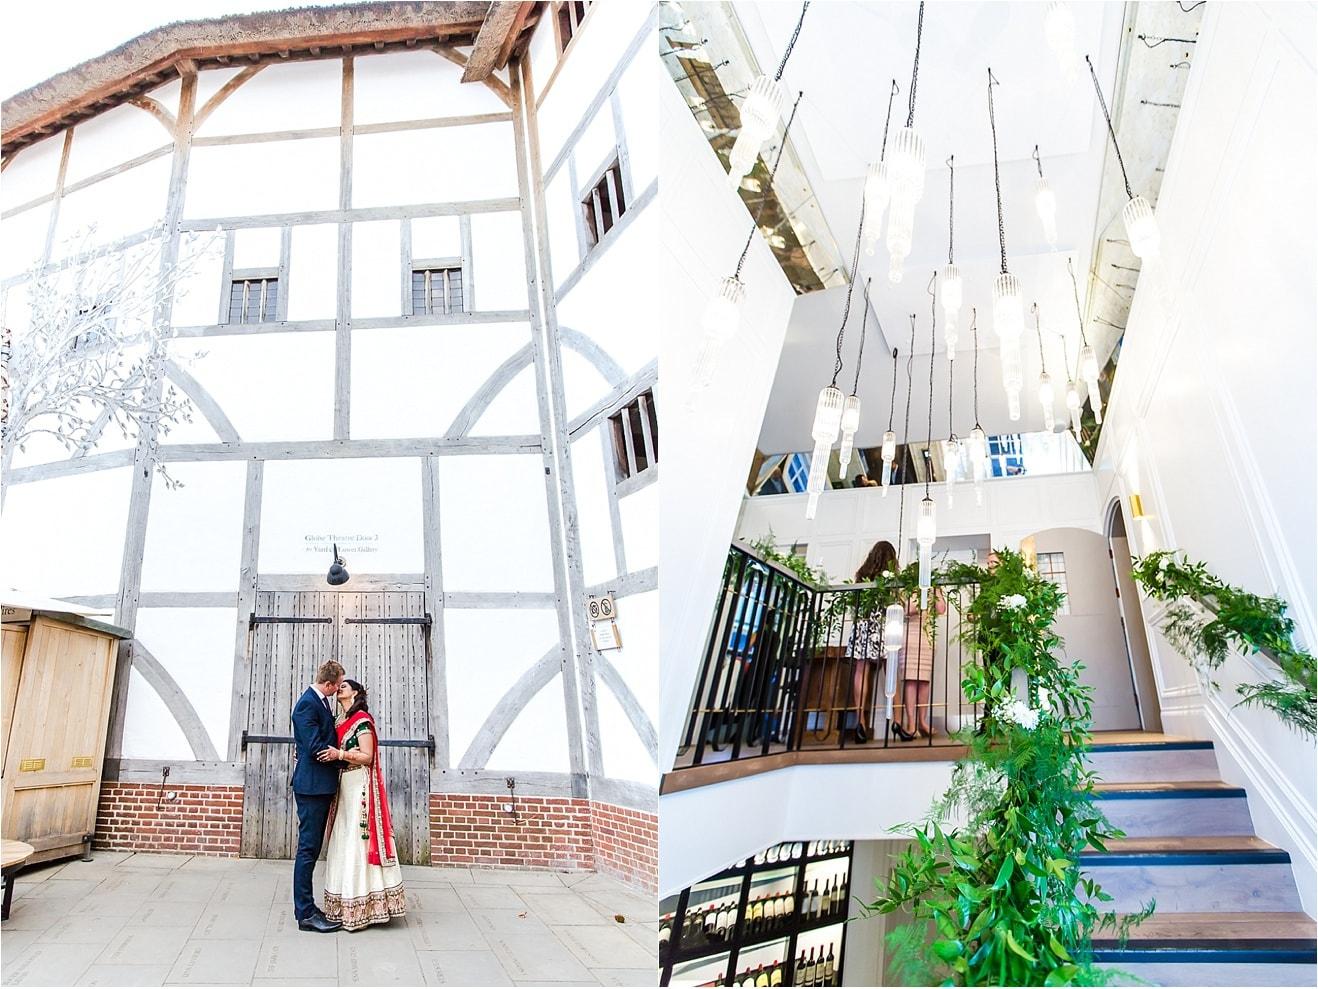 FETCHAM-PARK-SURREY-SWAN-GLOBE-LONDON-WEDDING-PHOTOGRAPHY-EDDIE-JUDD_0006